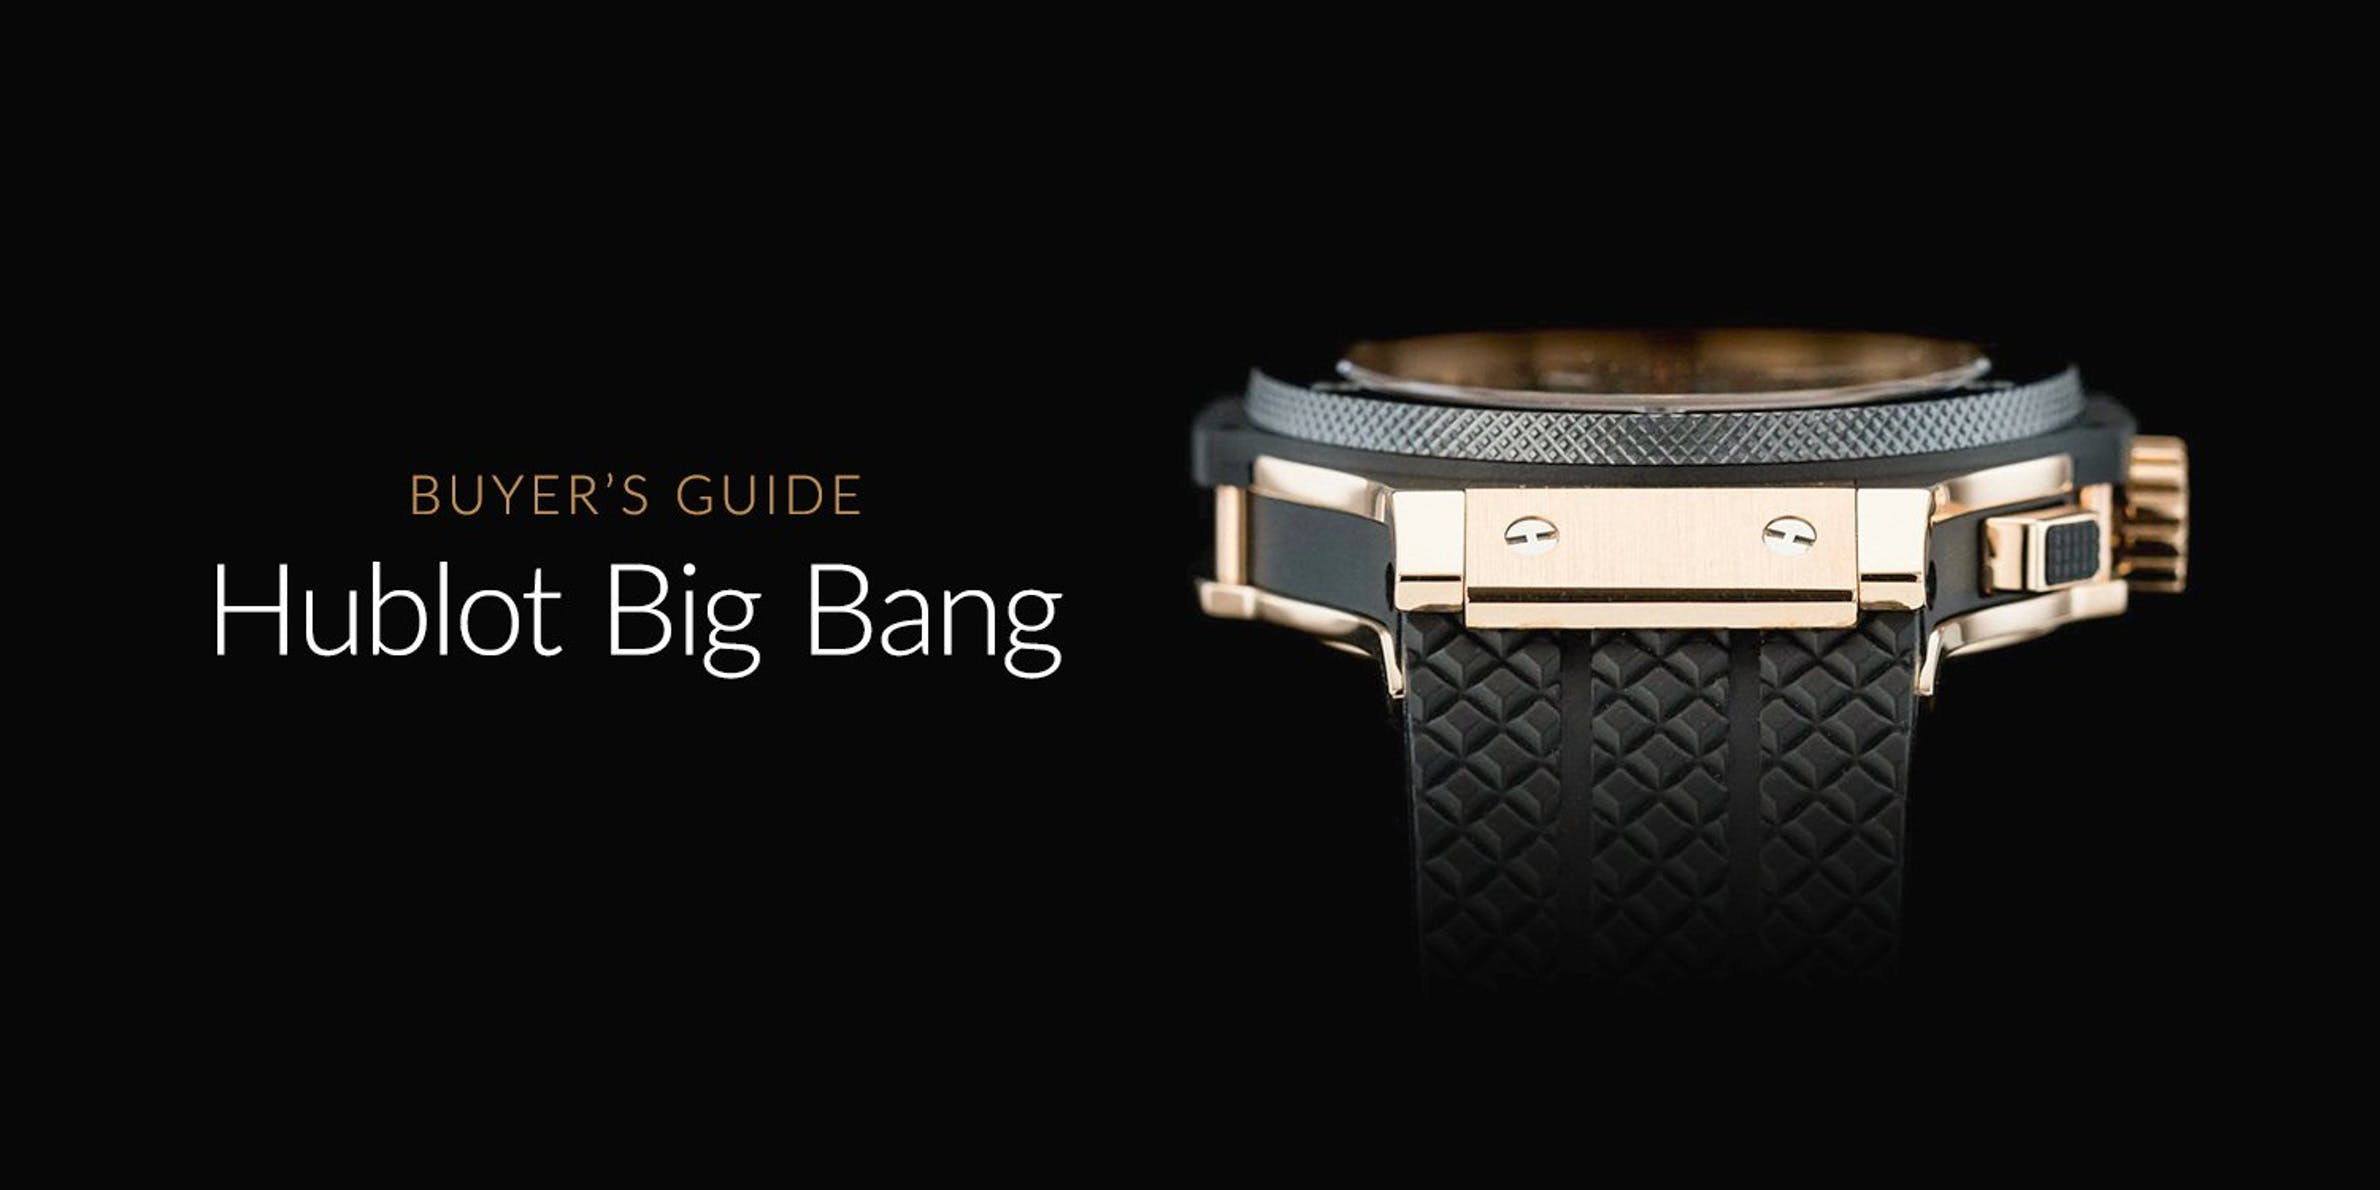 CAM-1709-Buyers-Guide-Hublot-Big-Bang-2-1-DE